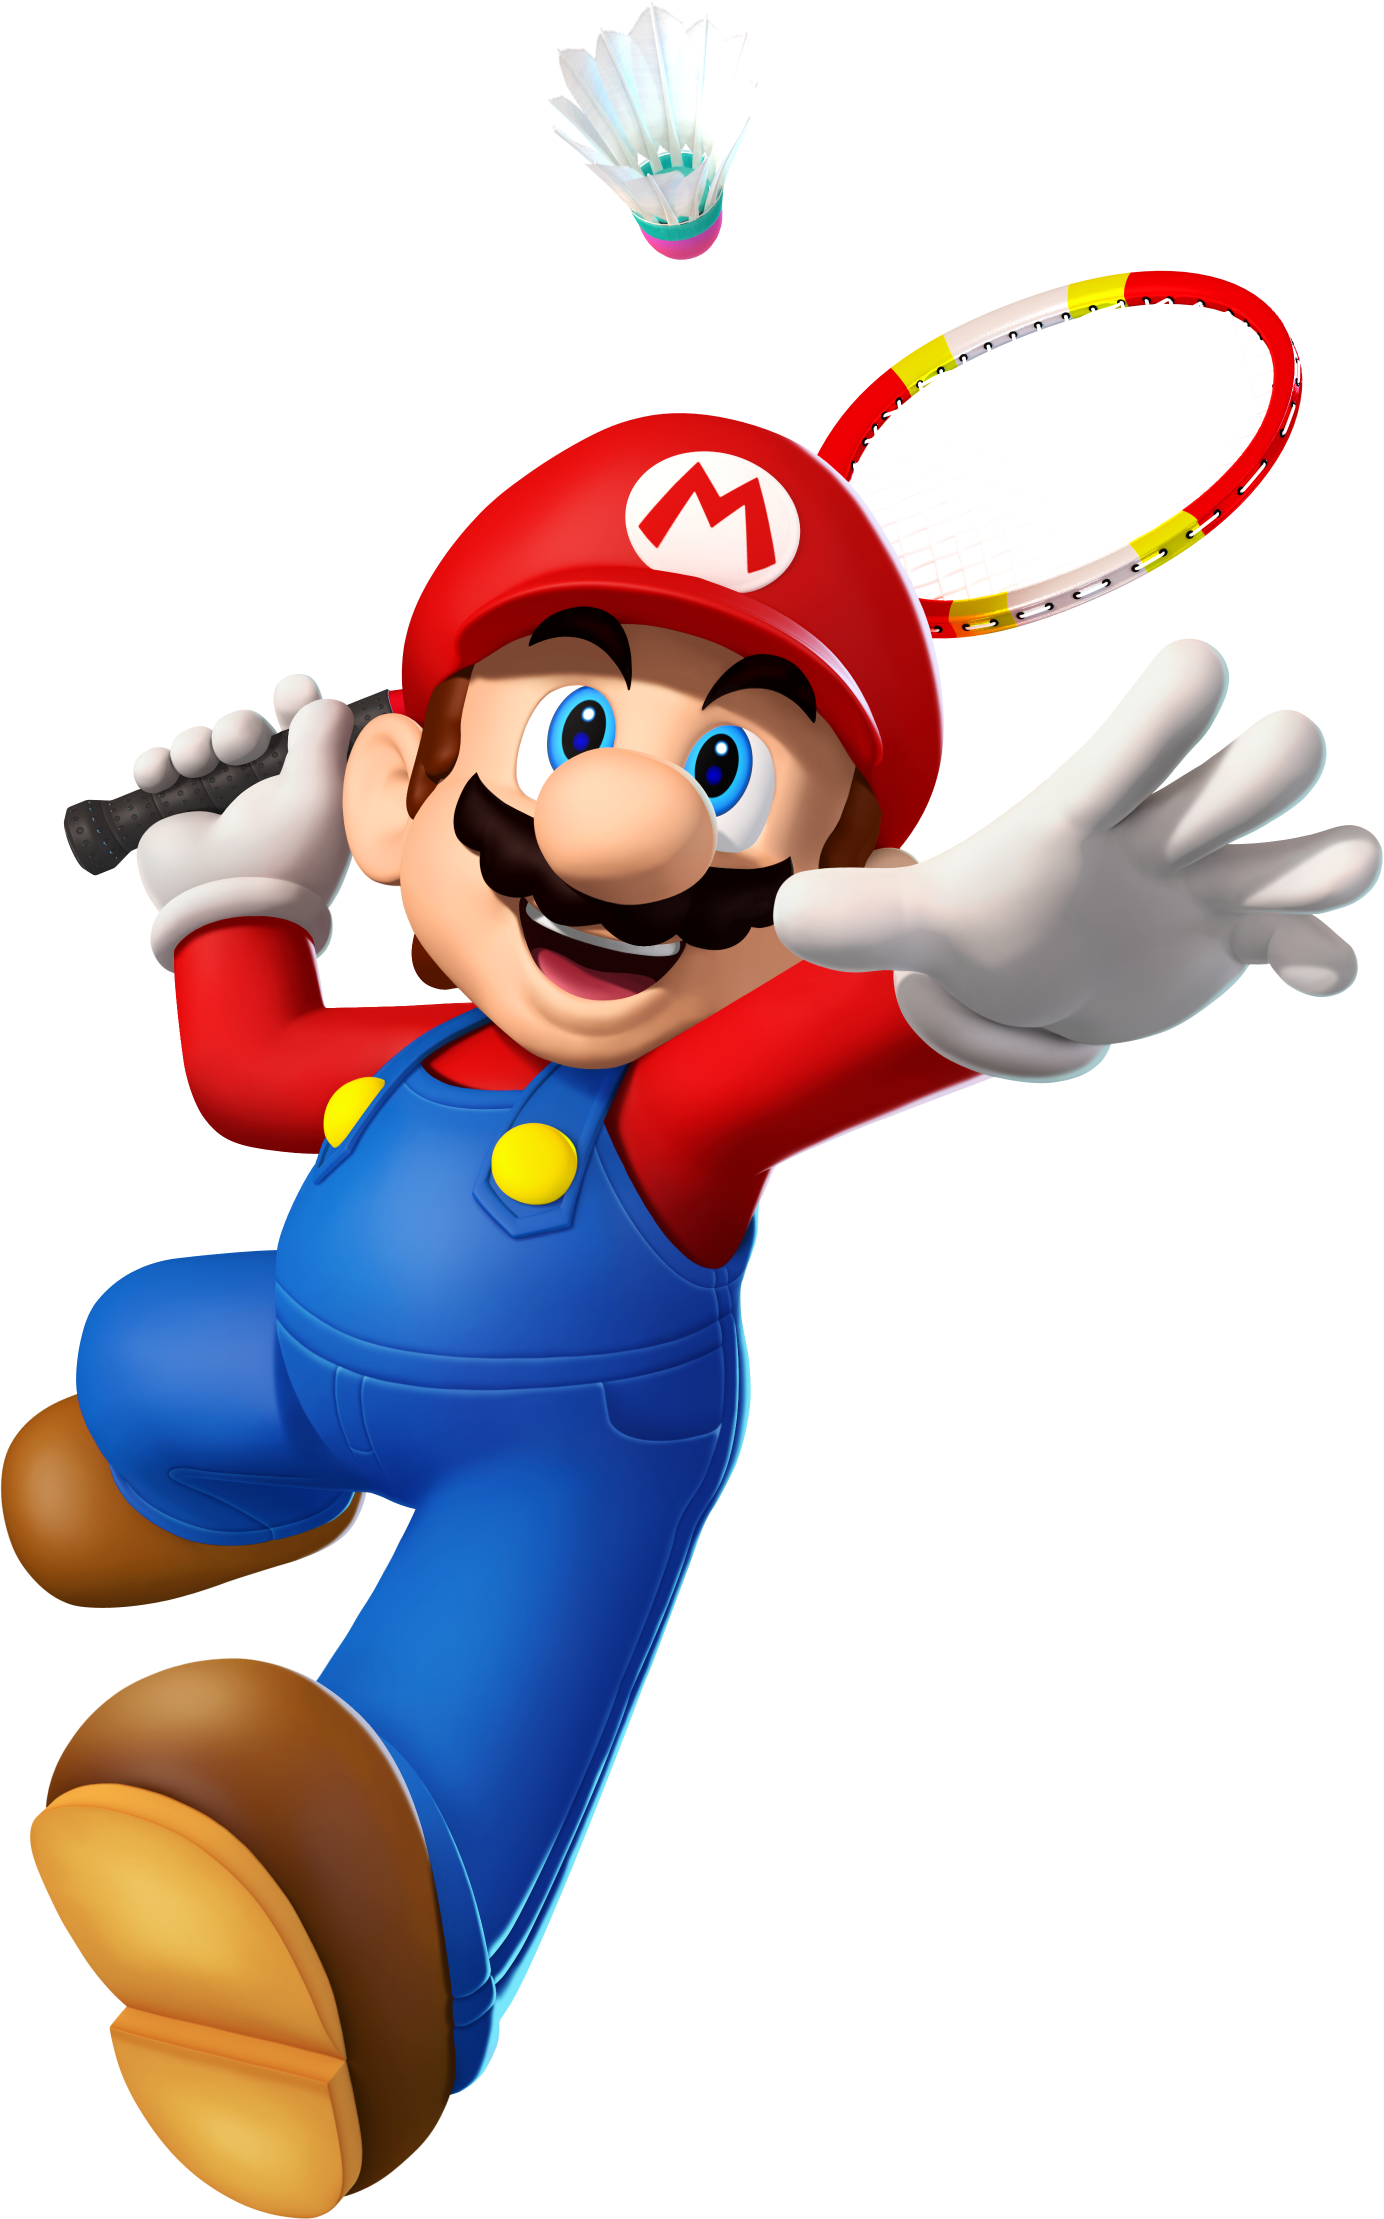 Pin De Charudeal Em Mario Sonic Super Mario Bros Desenho Super Mario Badminton